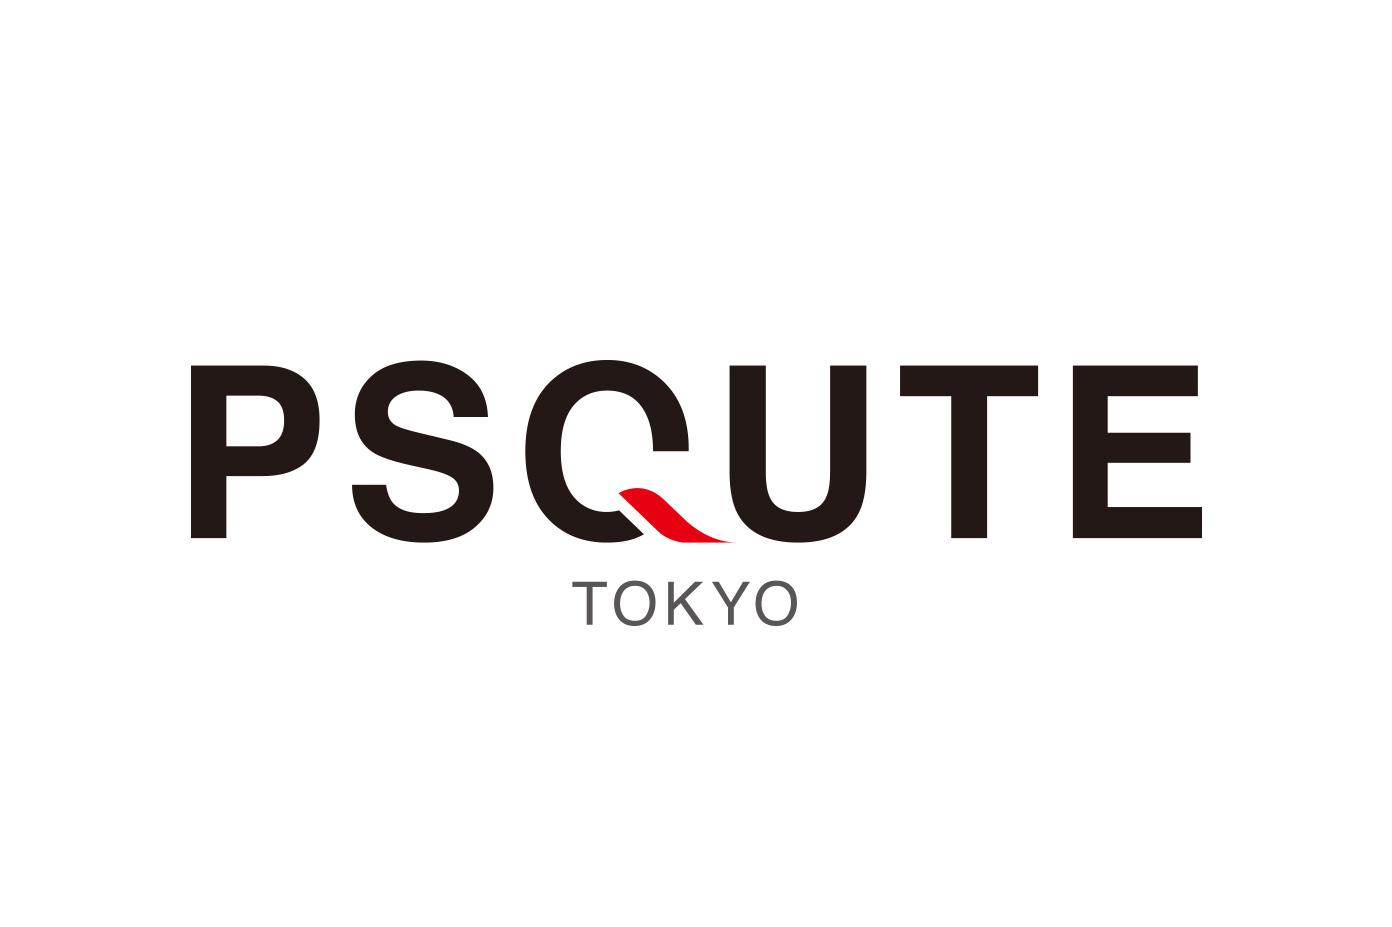 PSQUTEロゴデザイン